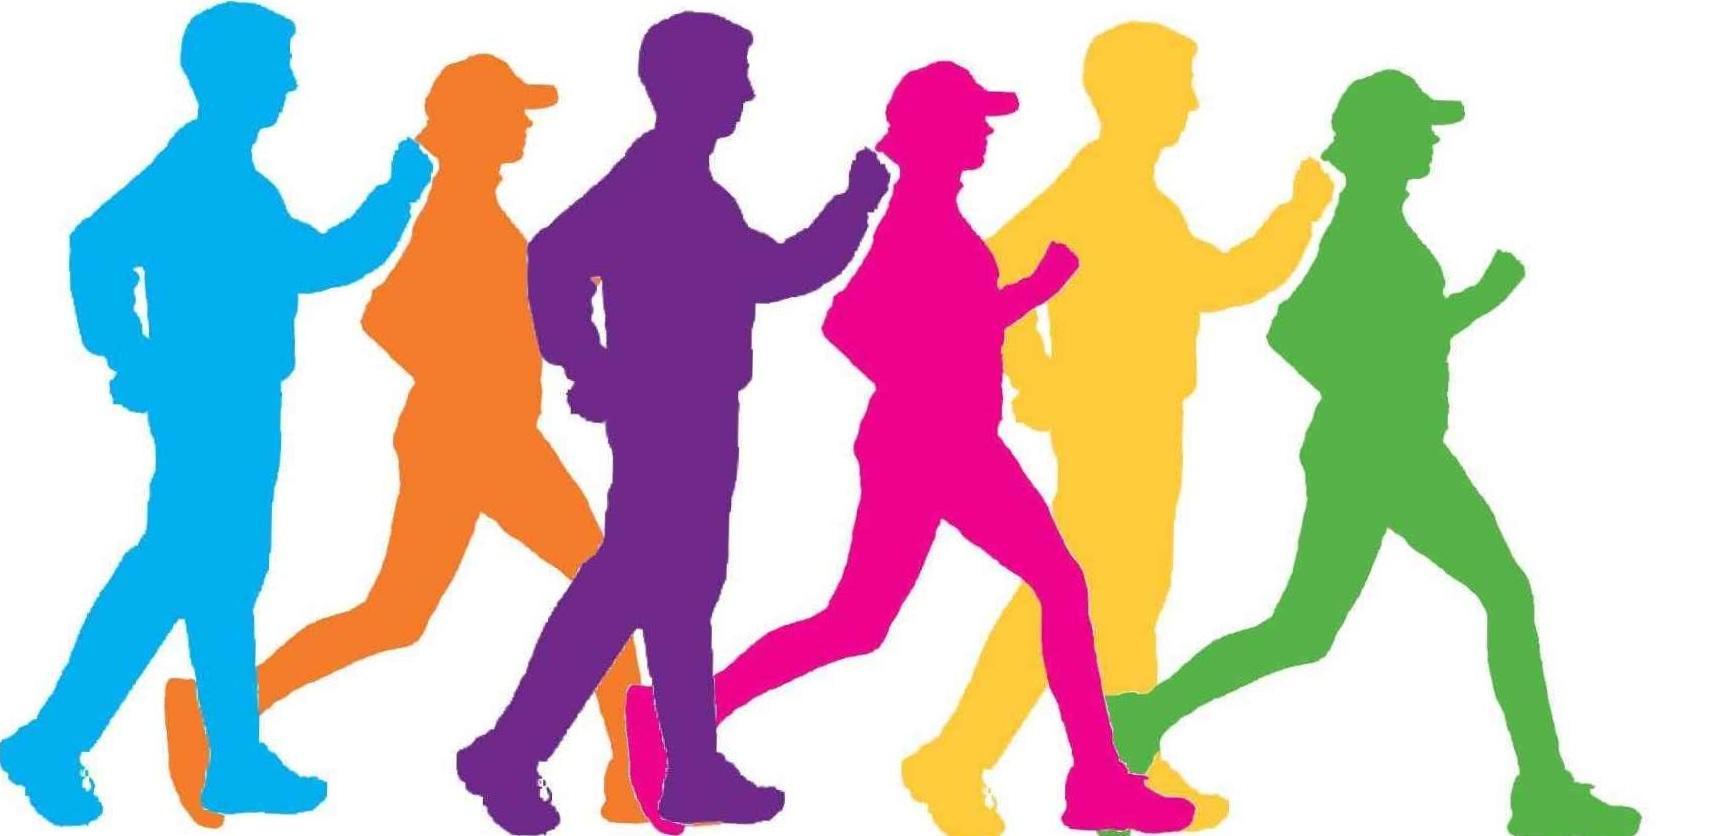 walk-run-walk-run-intervals.jpg